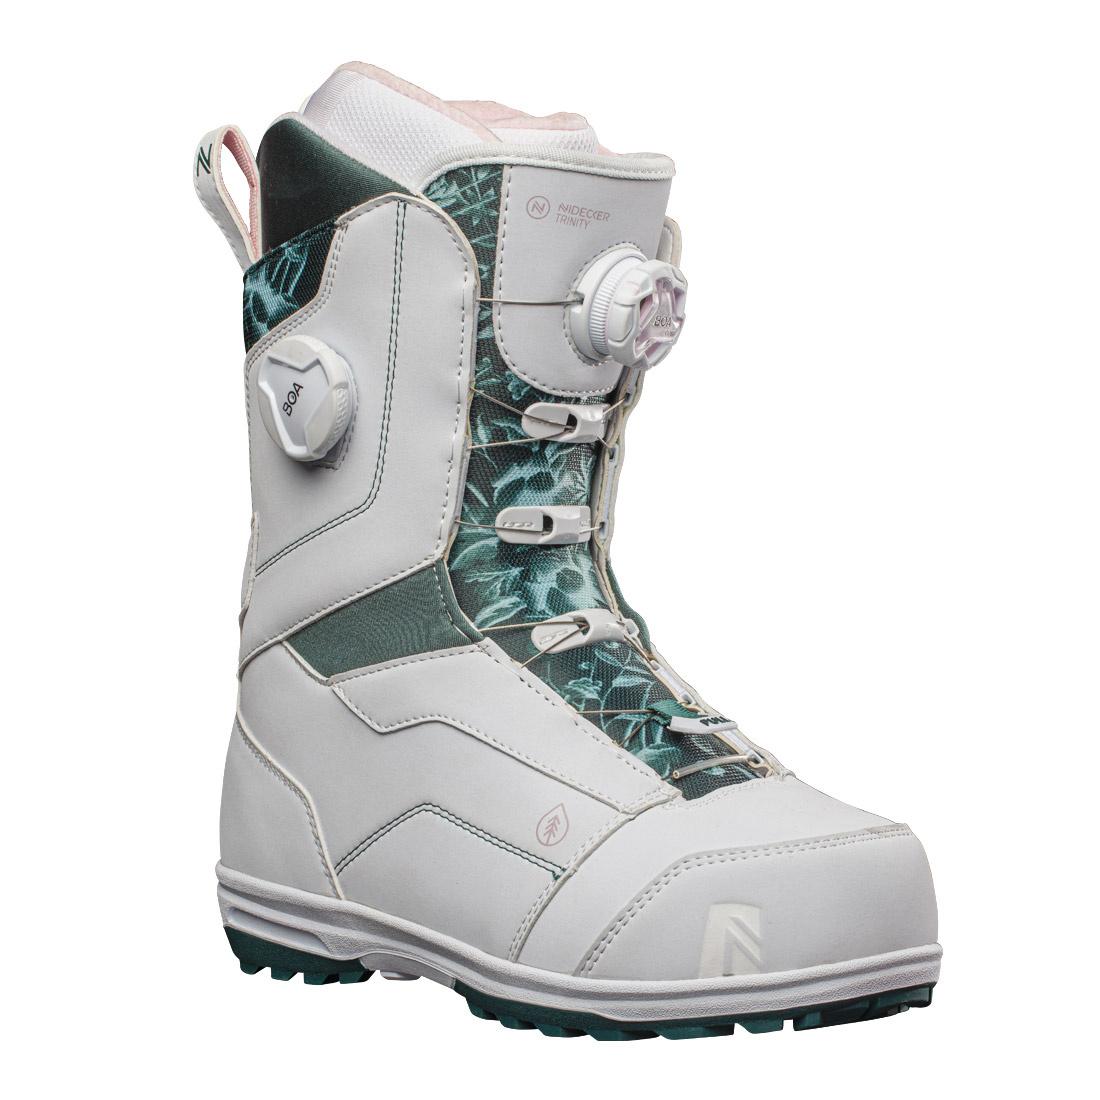 Boots snowboard Femei Nidecker Trinity Gri 20/21 imagine